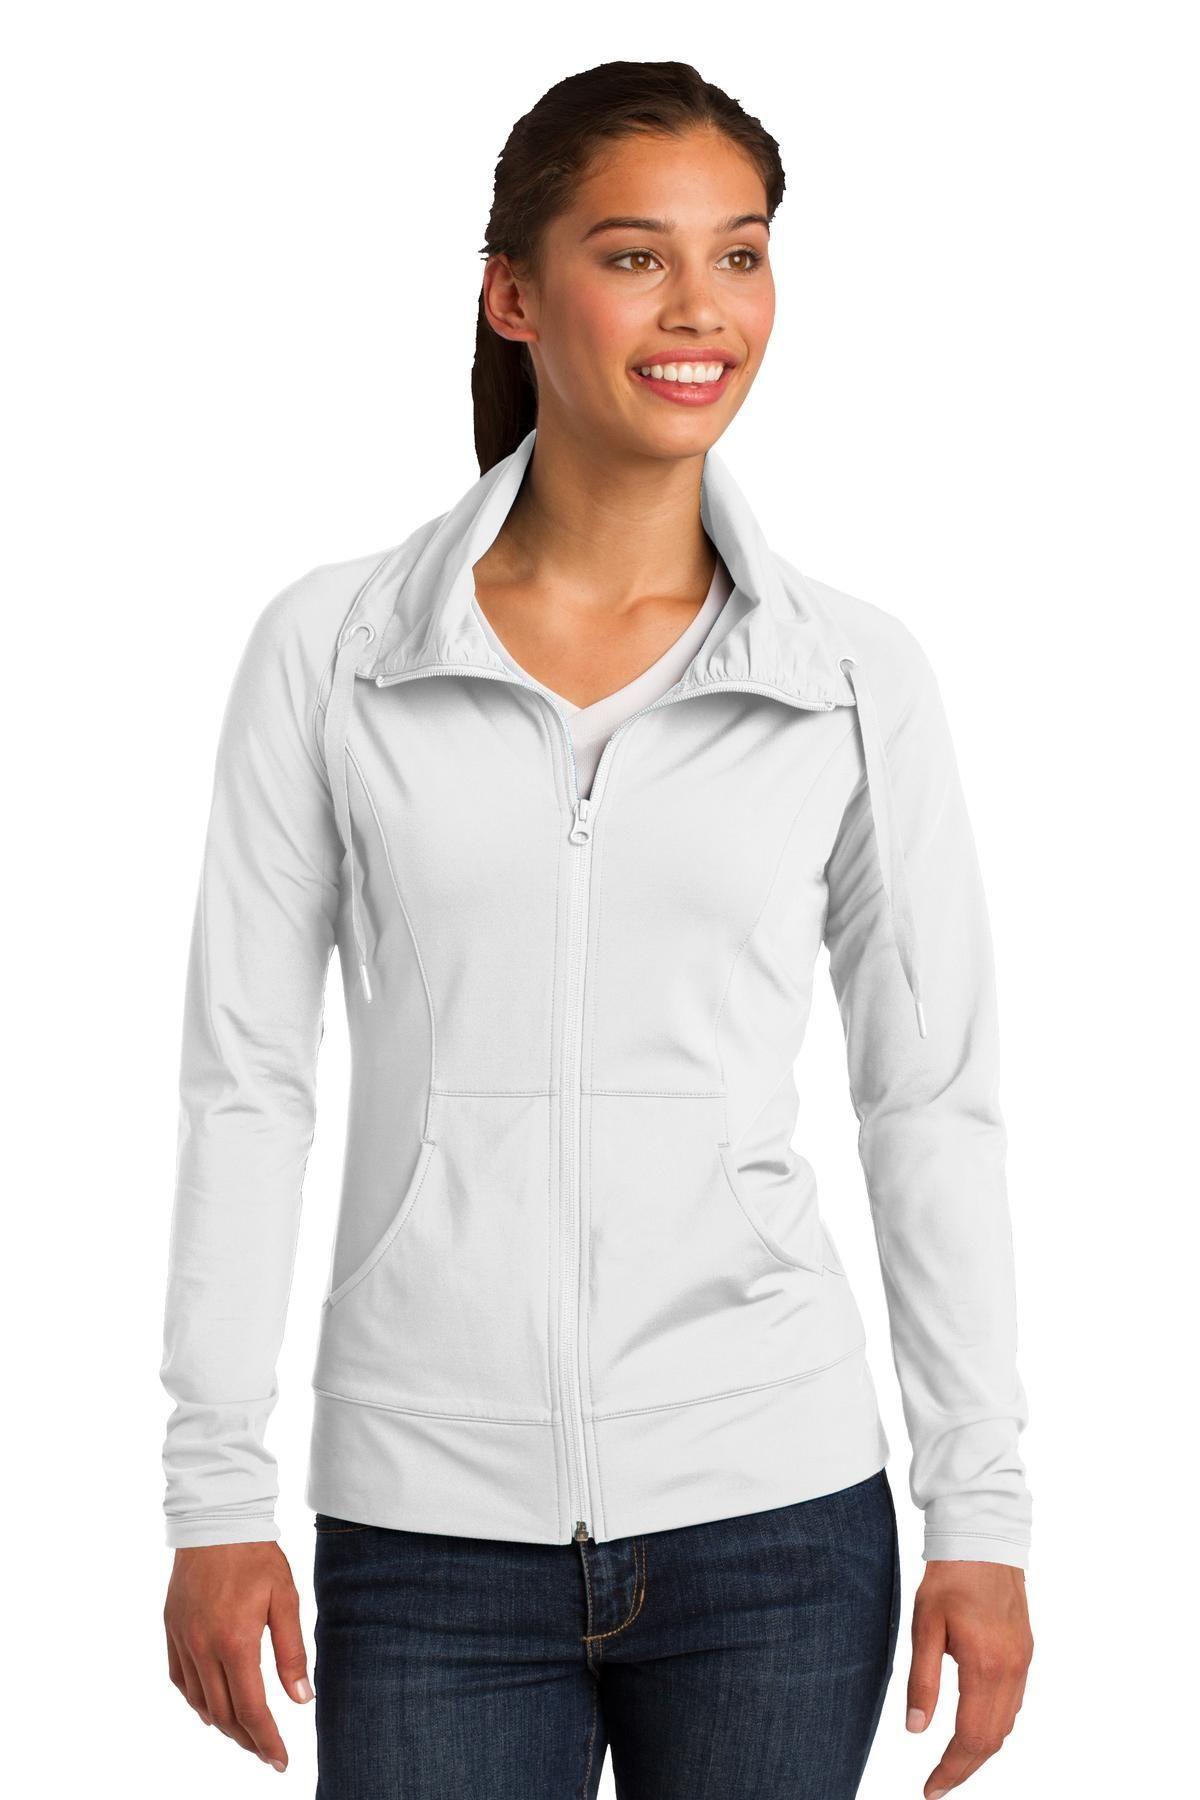 SportTek Ladies SportWick Stretch FullZip Jacket LST852